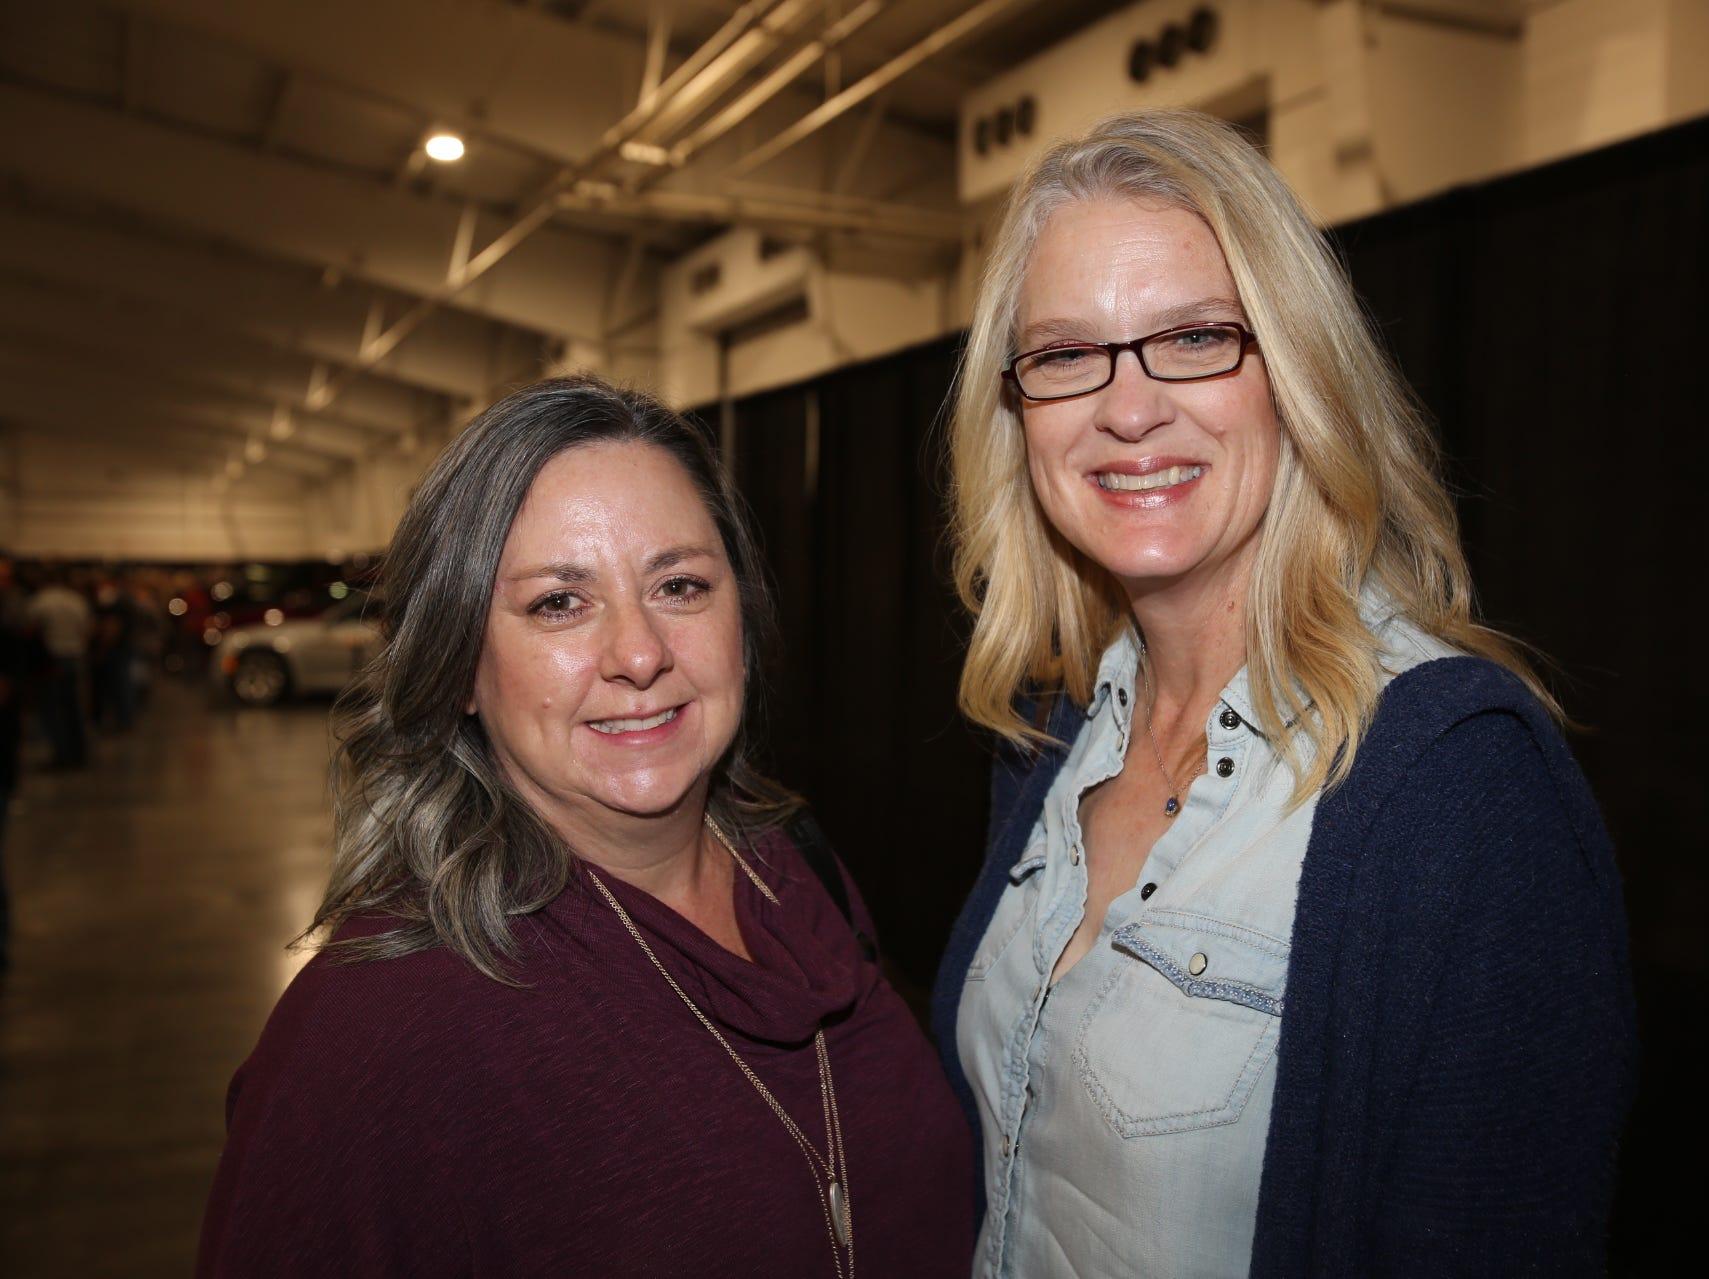 Rhonda Bewley and Cindy Jackson